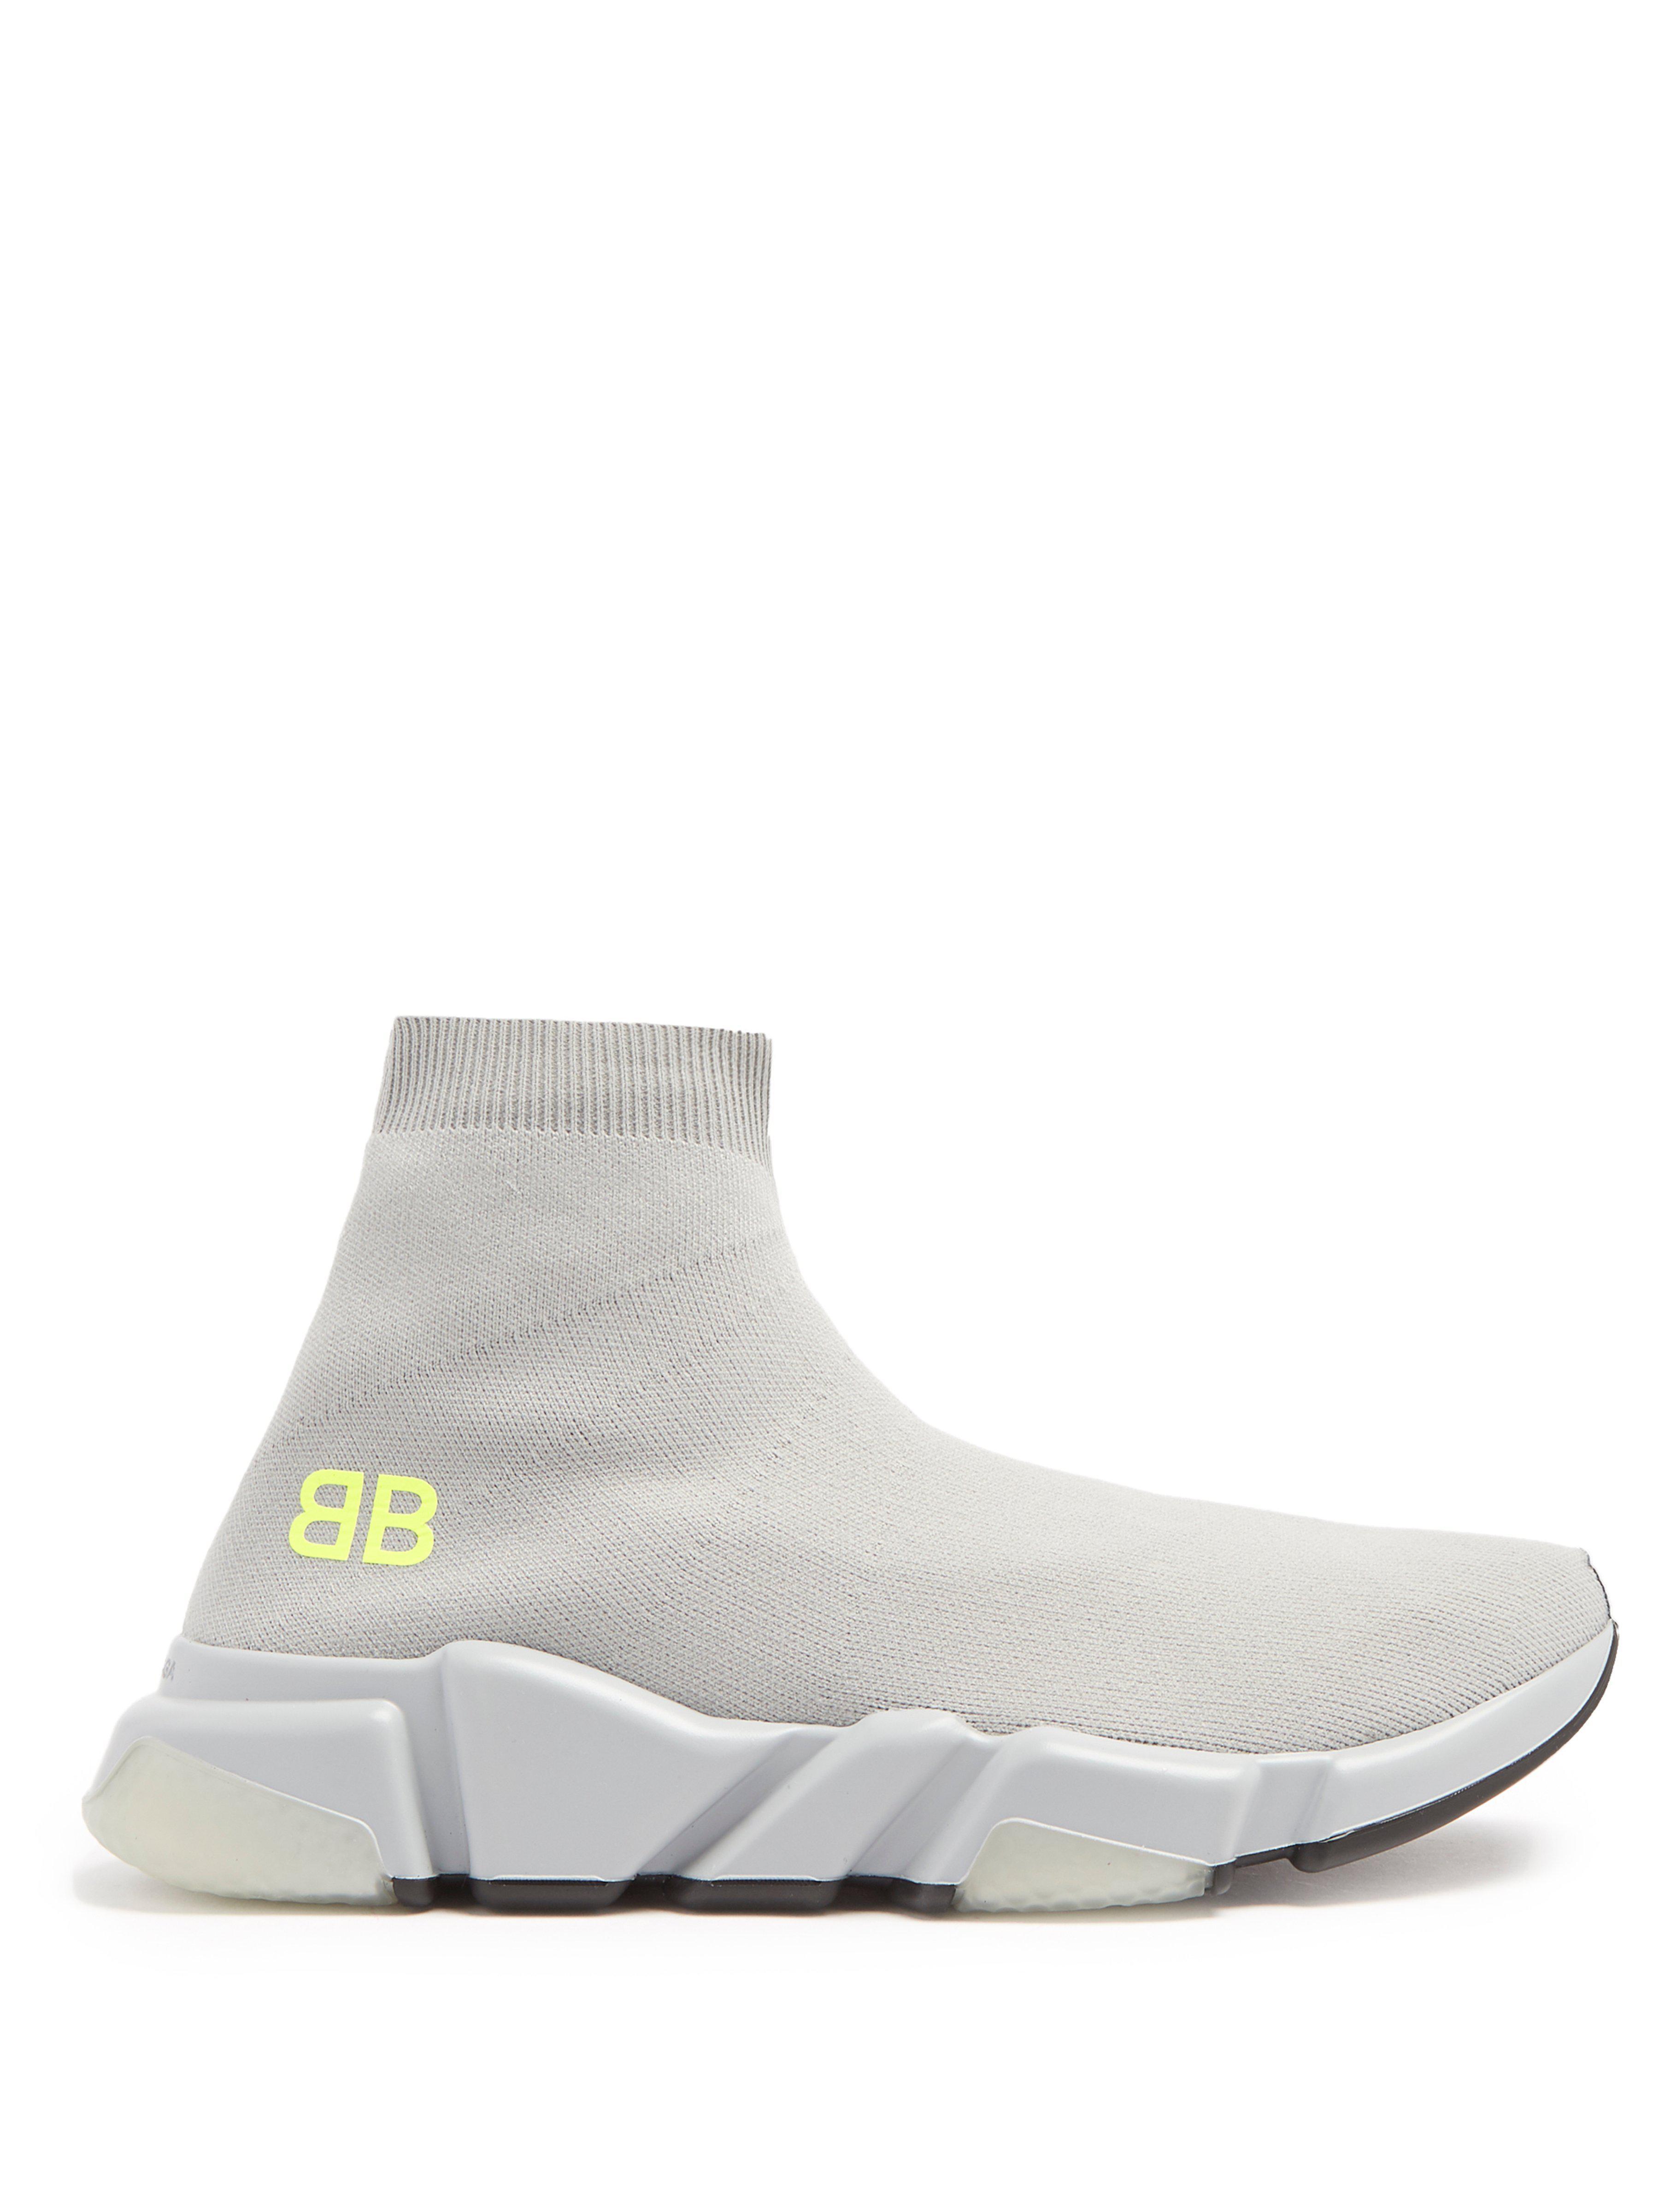 ba9c73bfc46 Lyst - Baskets montantes effet chaussette Speed Balenciaga - 2 % de ...